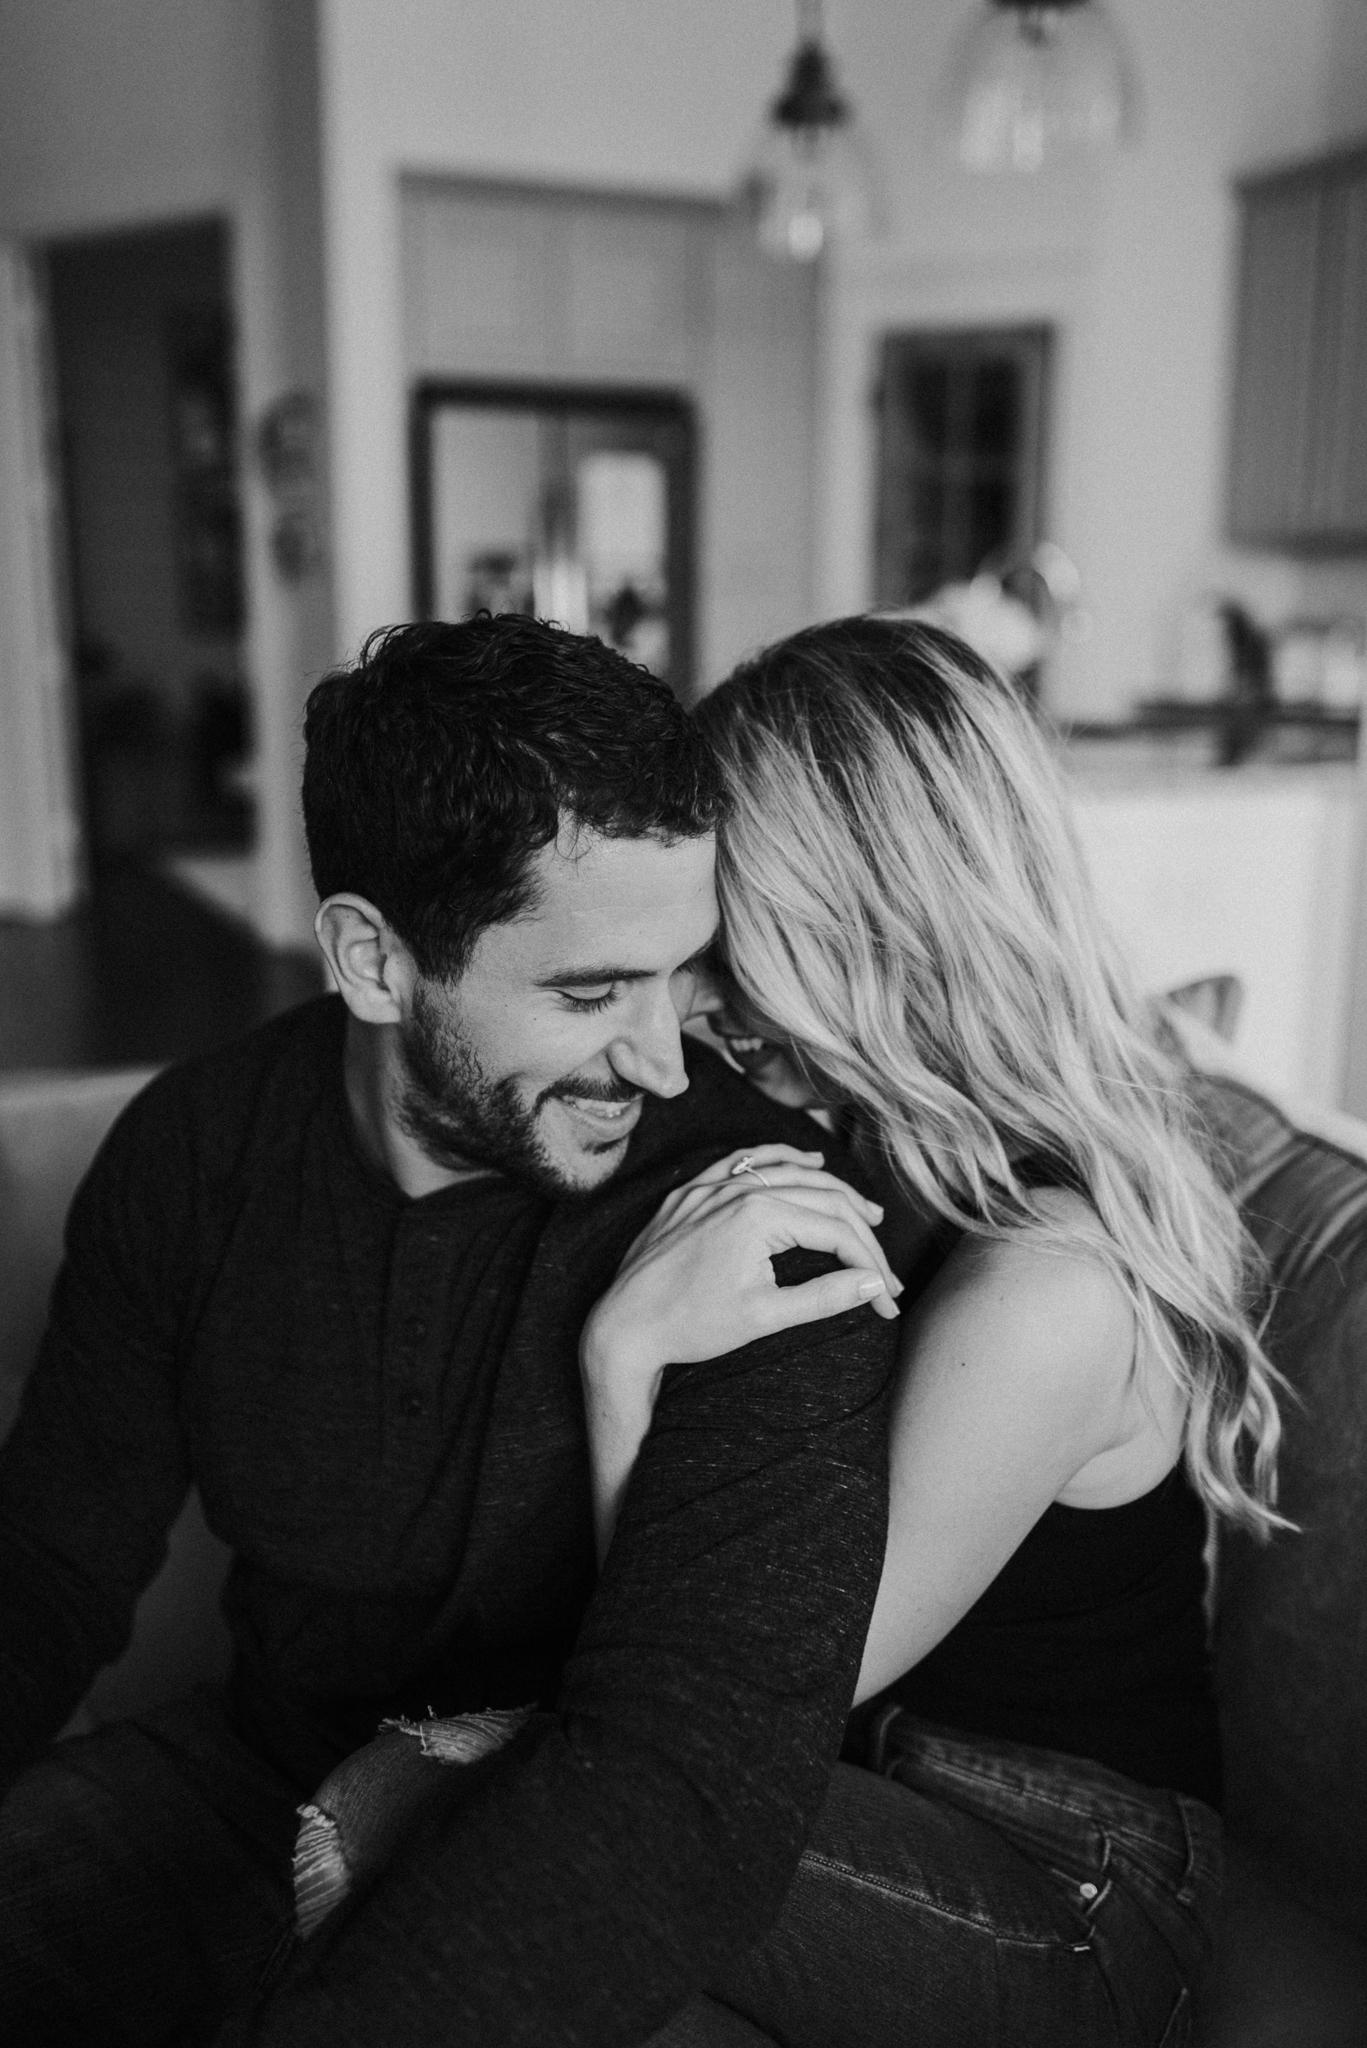 Houston Wedding Photographer-Houston In Home Engagement Session- Houston Wedding Photographer -Kristen Giles Photography-127.jpg